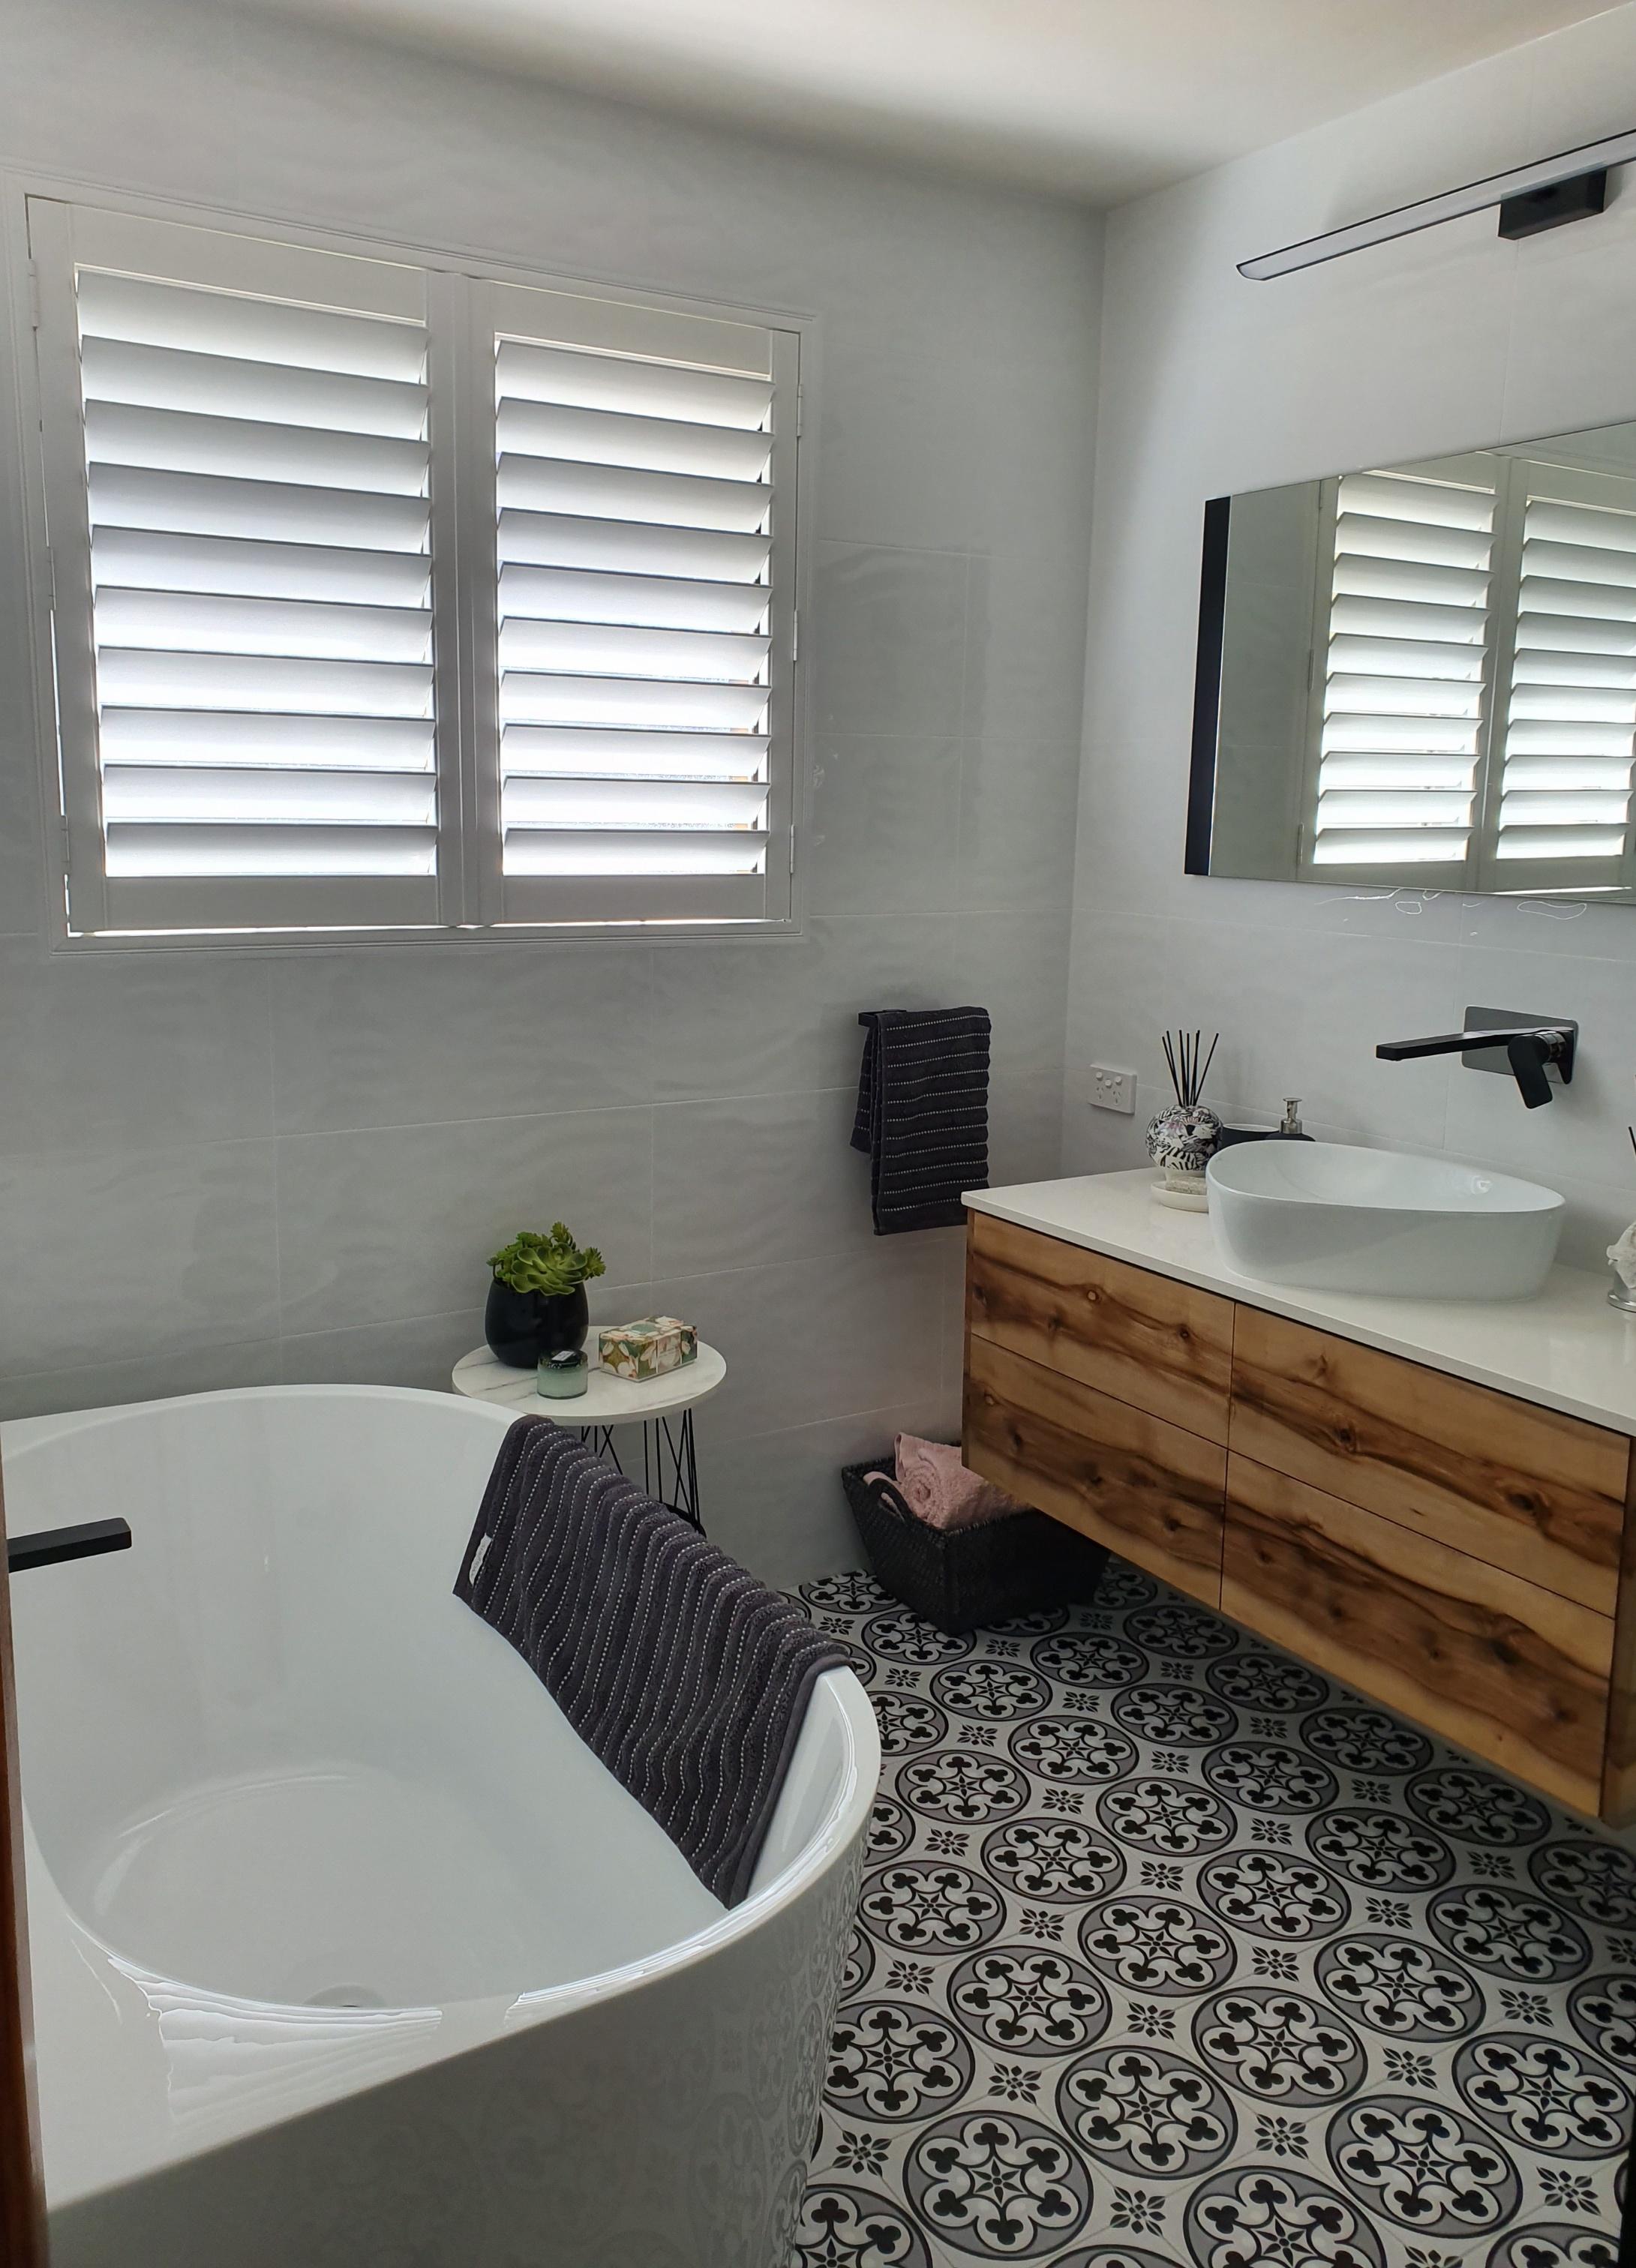 Plantation shutters in bathroom